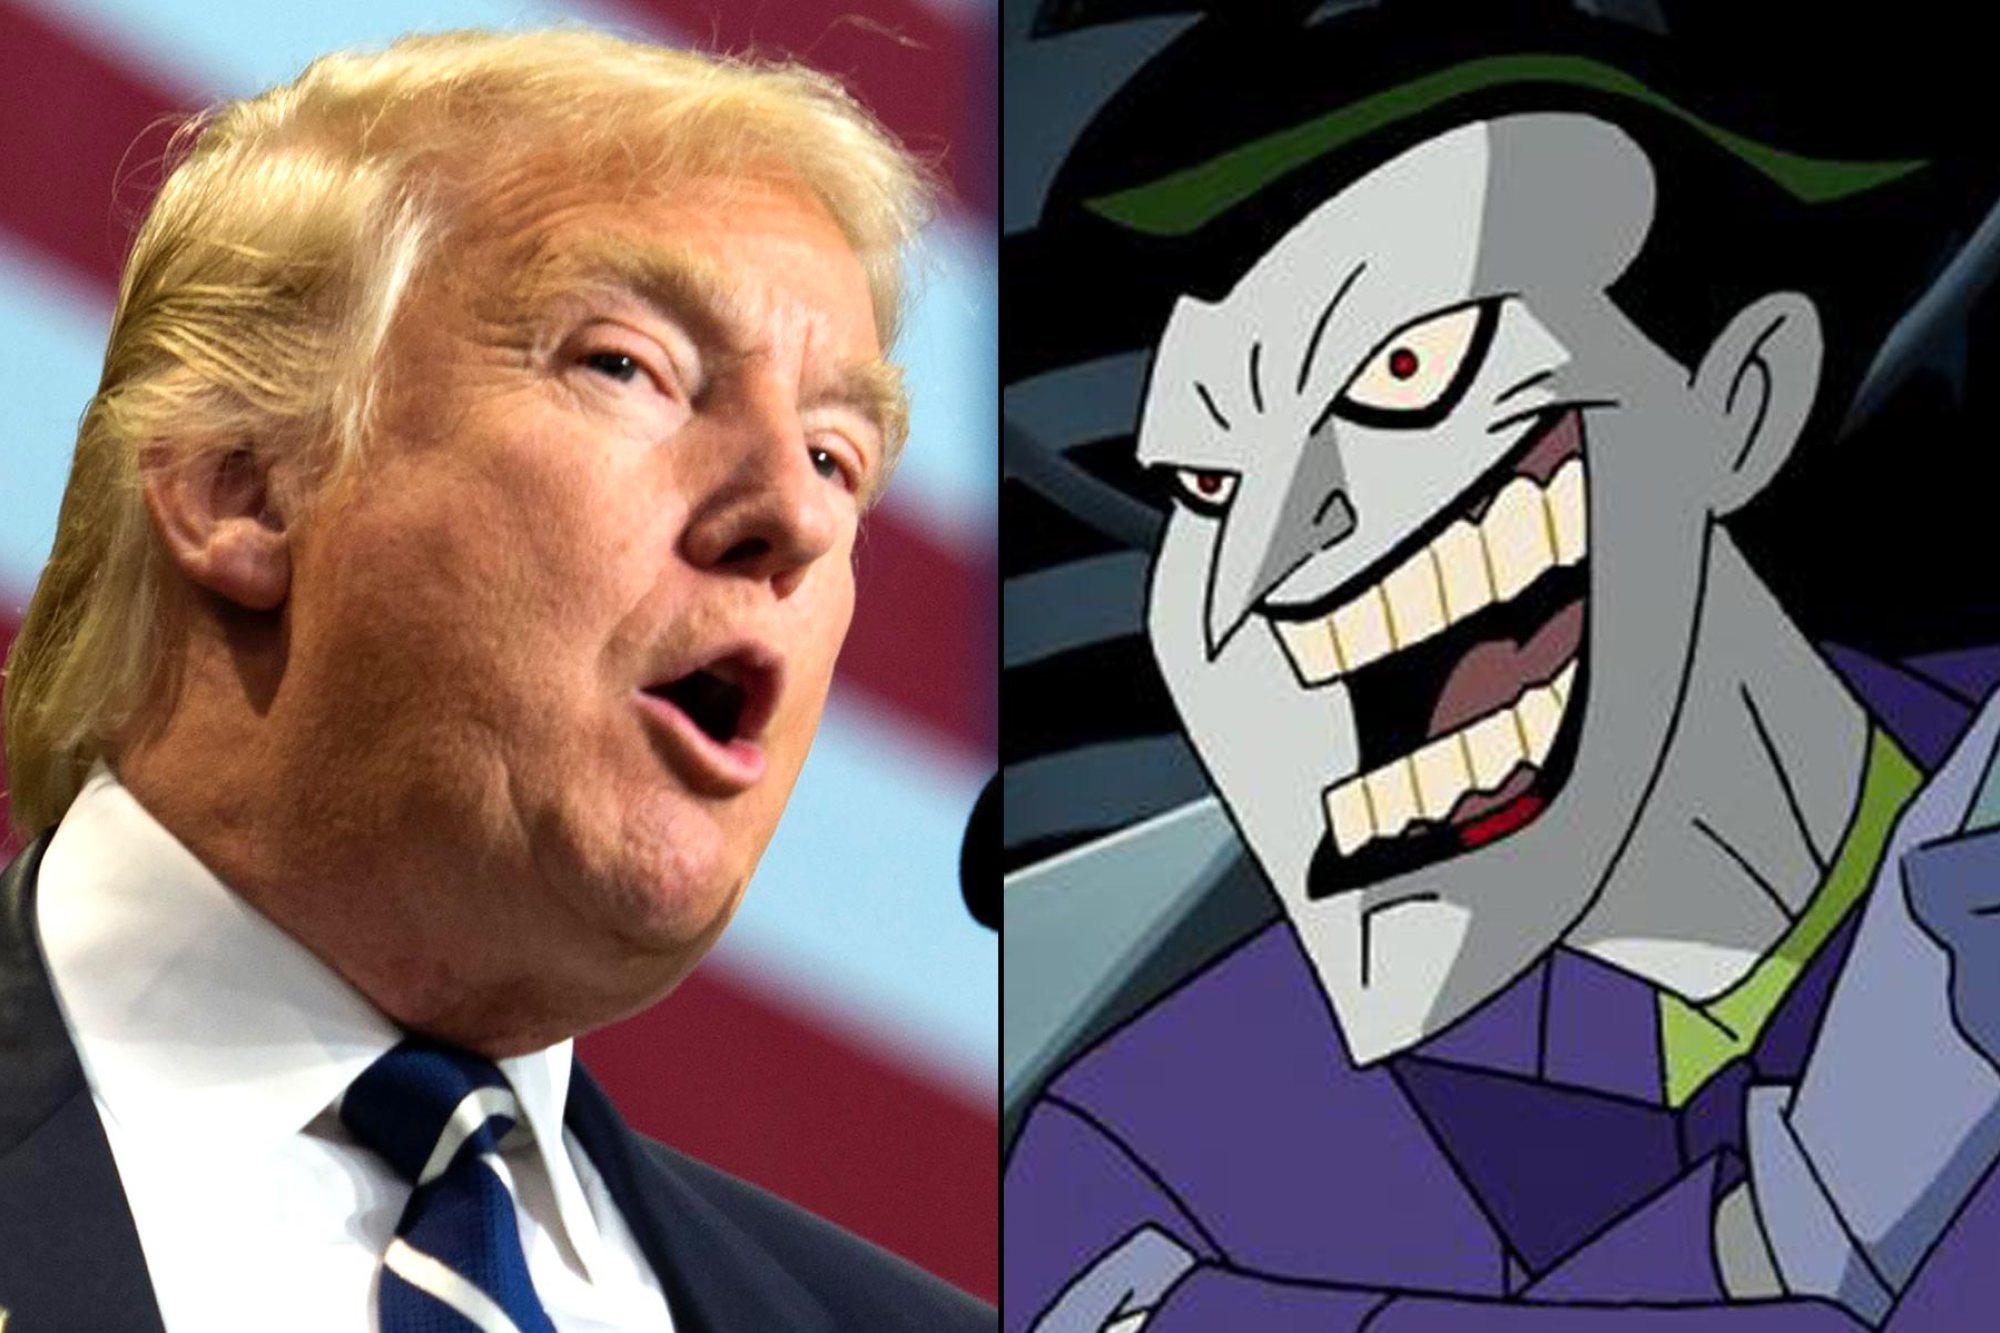 joker-donald-trump